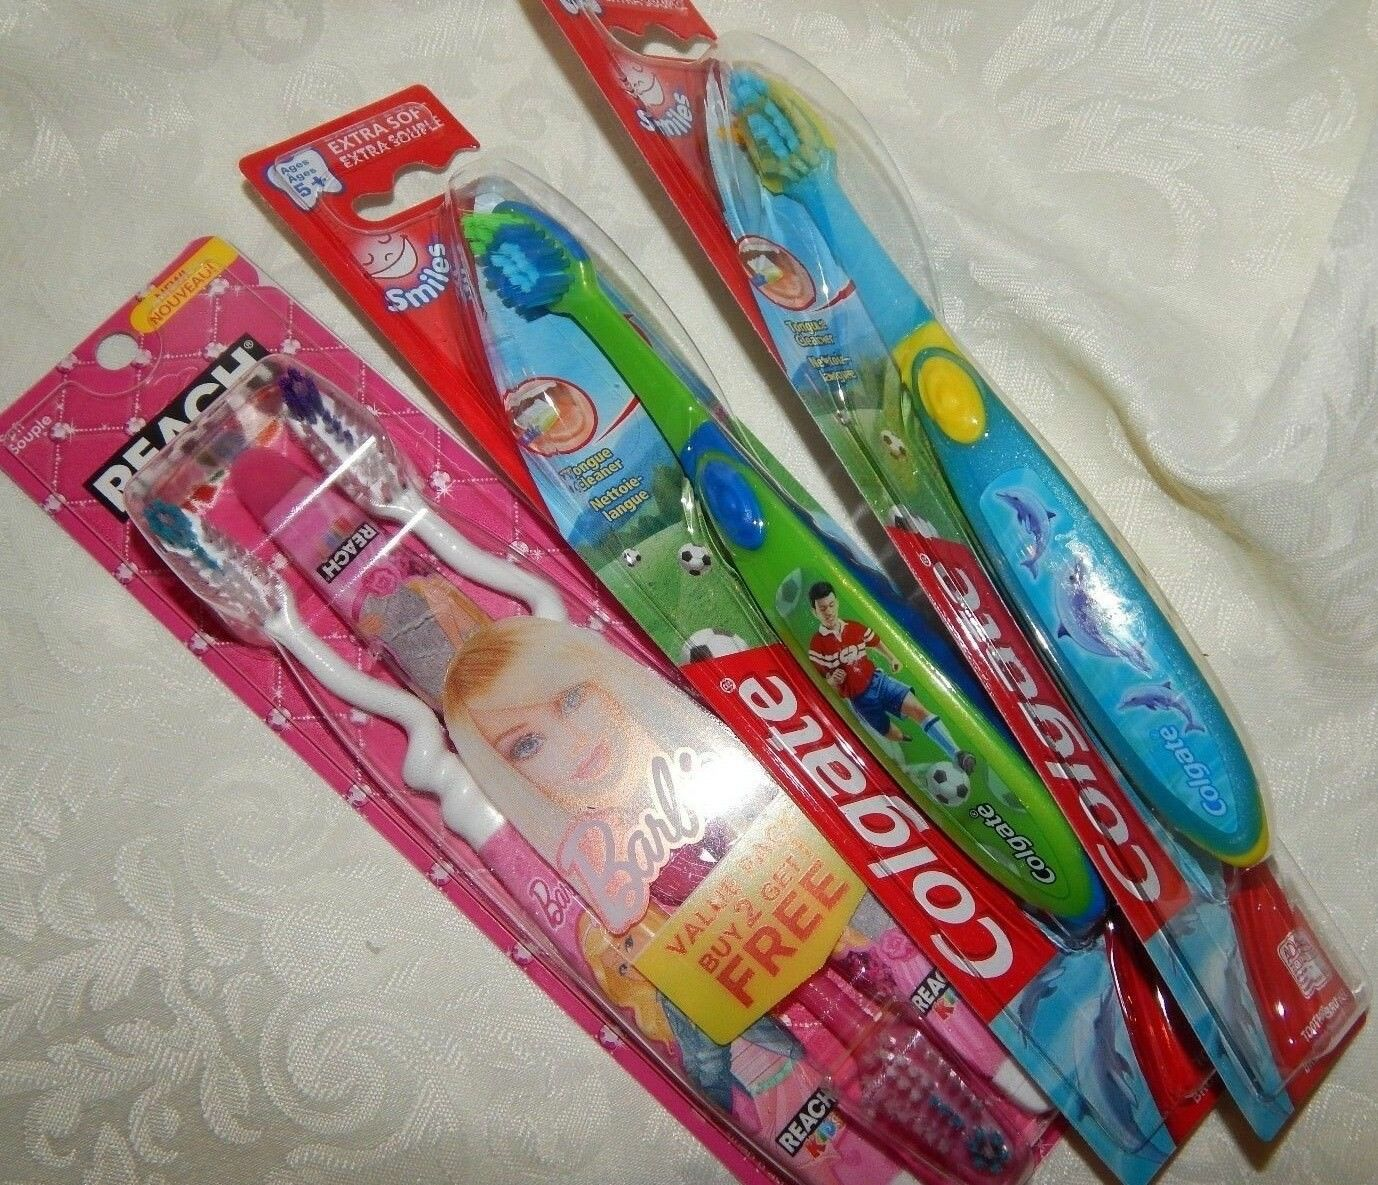 Toothbrushes Colgate Reach KIDS 5 Lot Barbie Dolphin Boys Gi